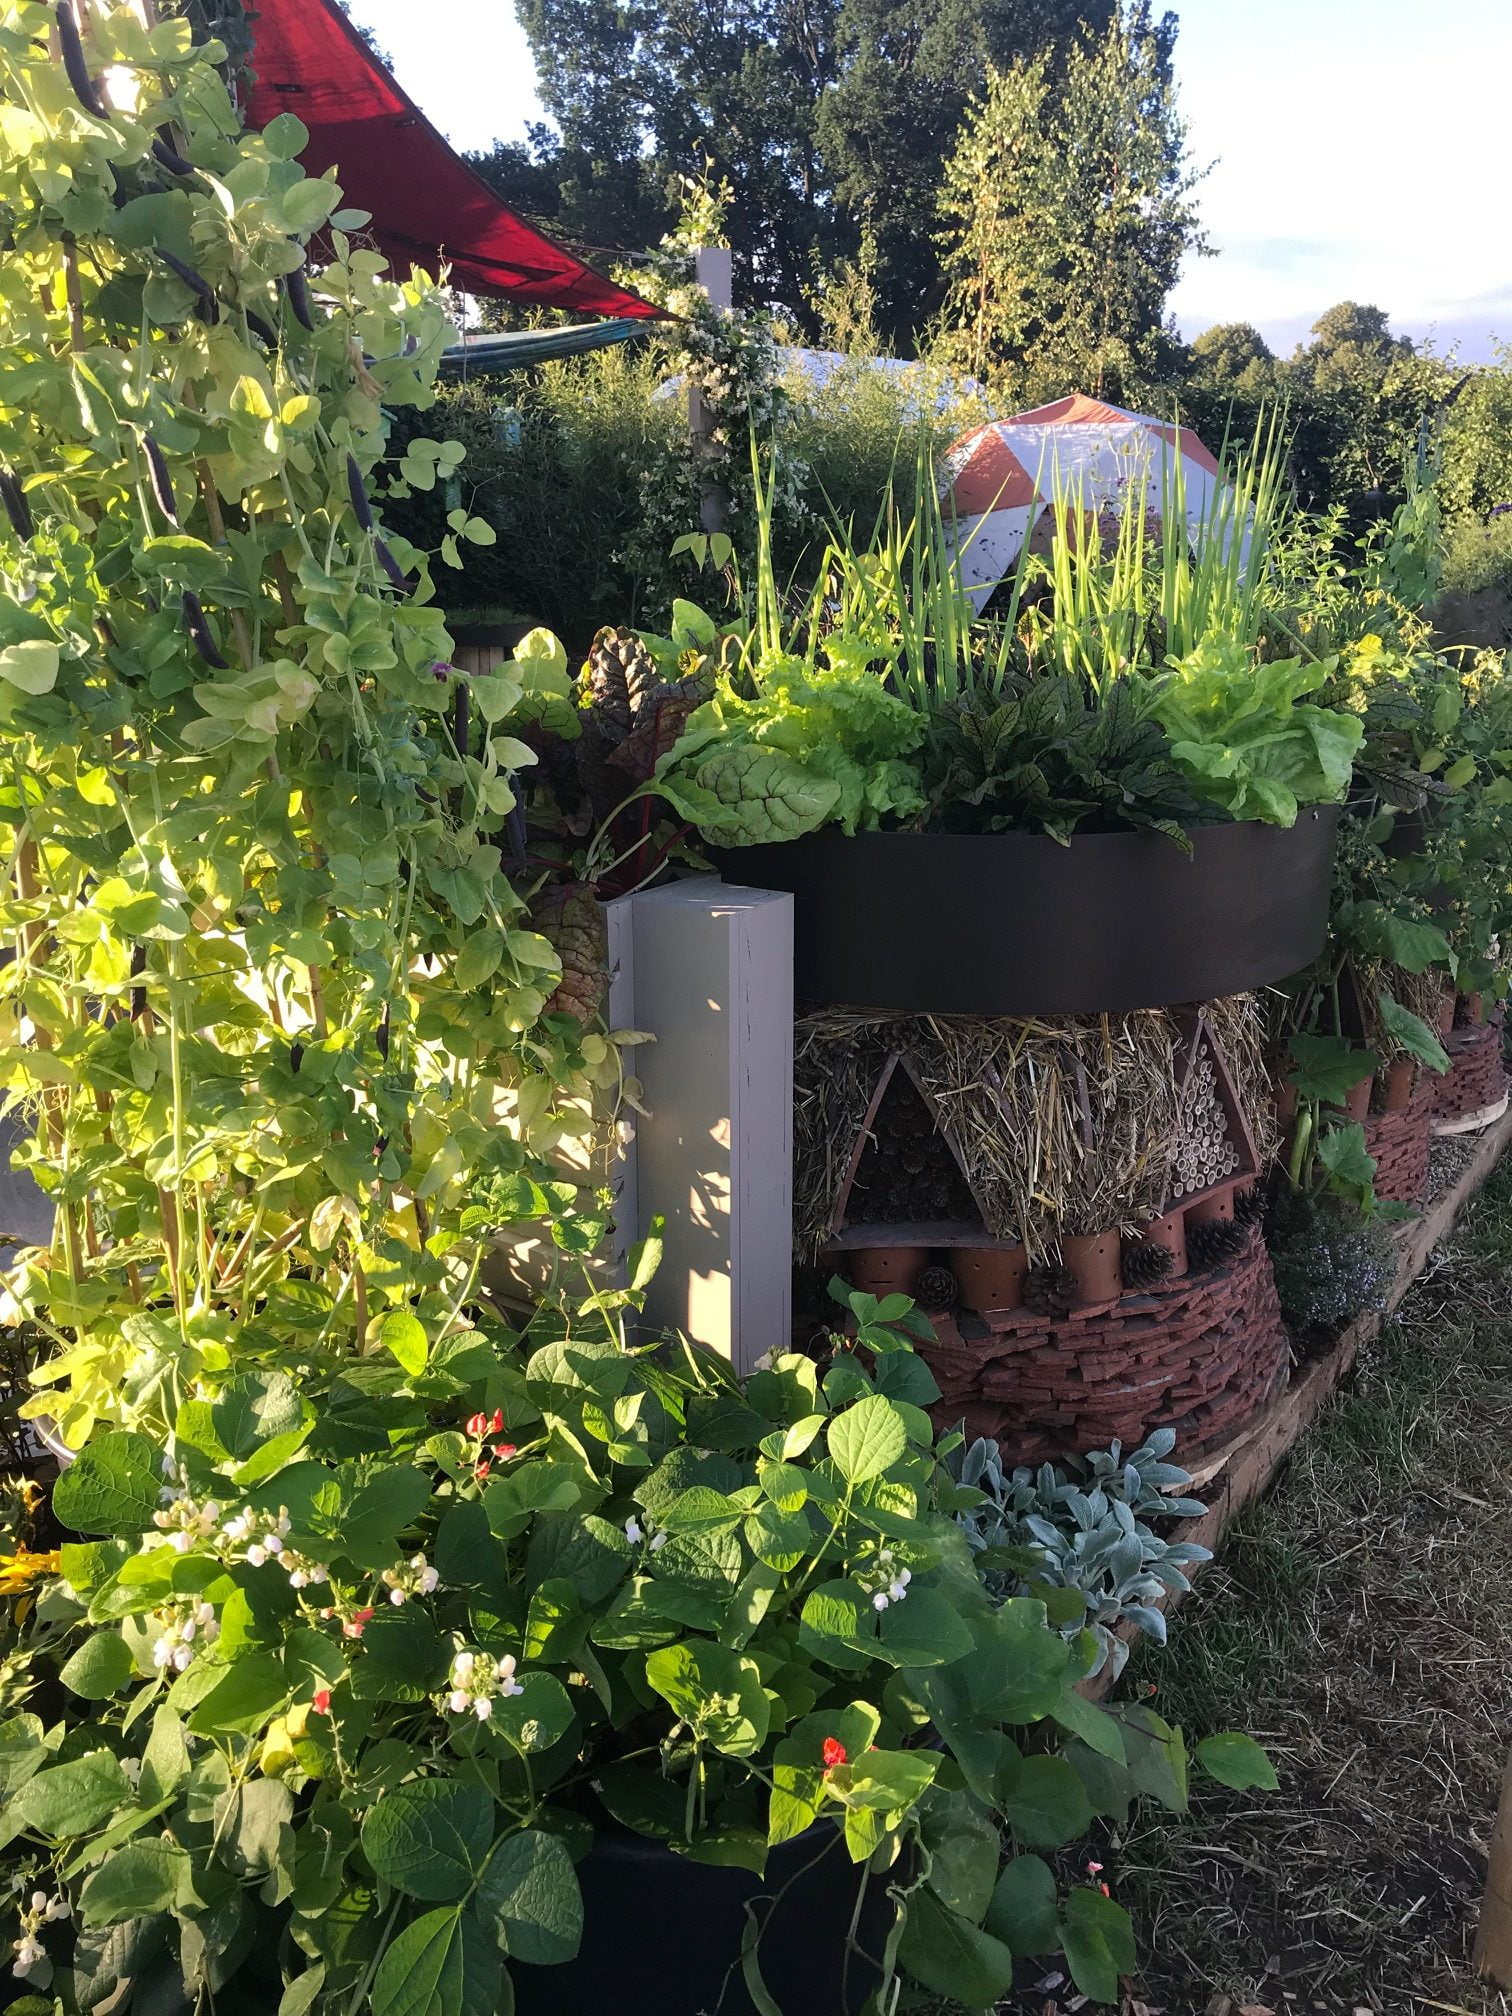 Year of Green Action Garden